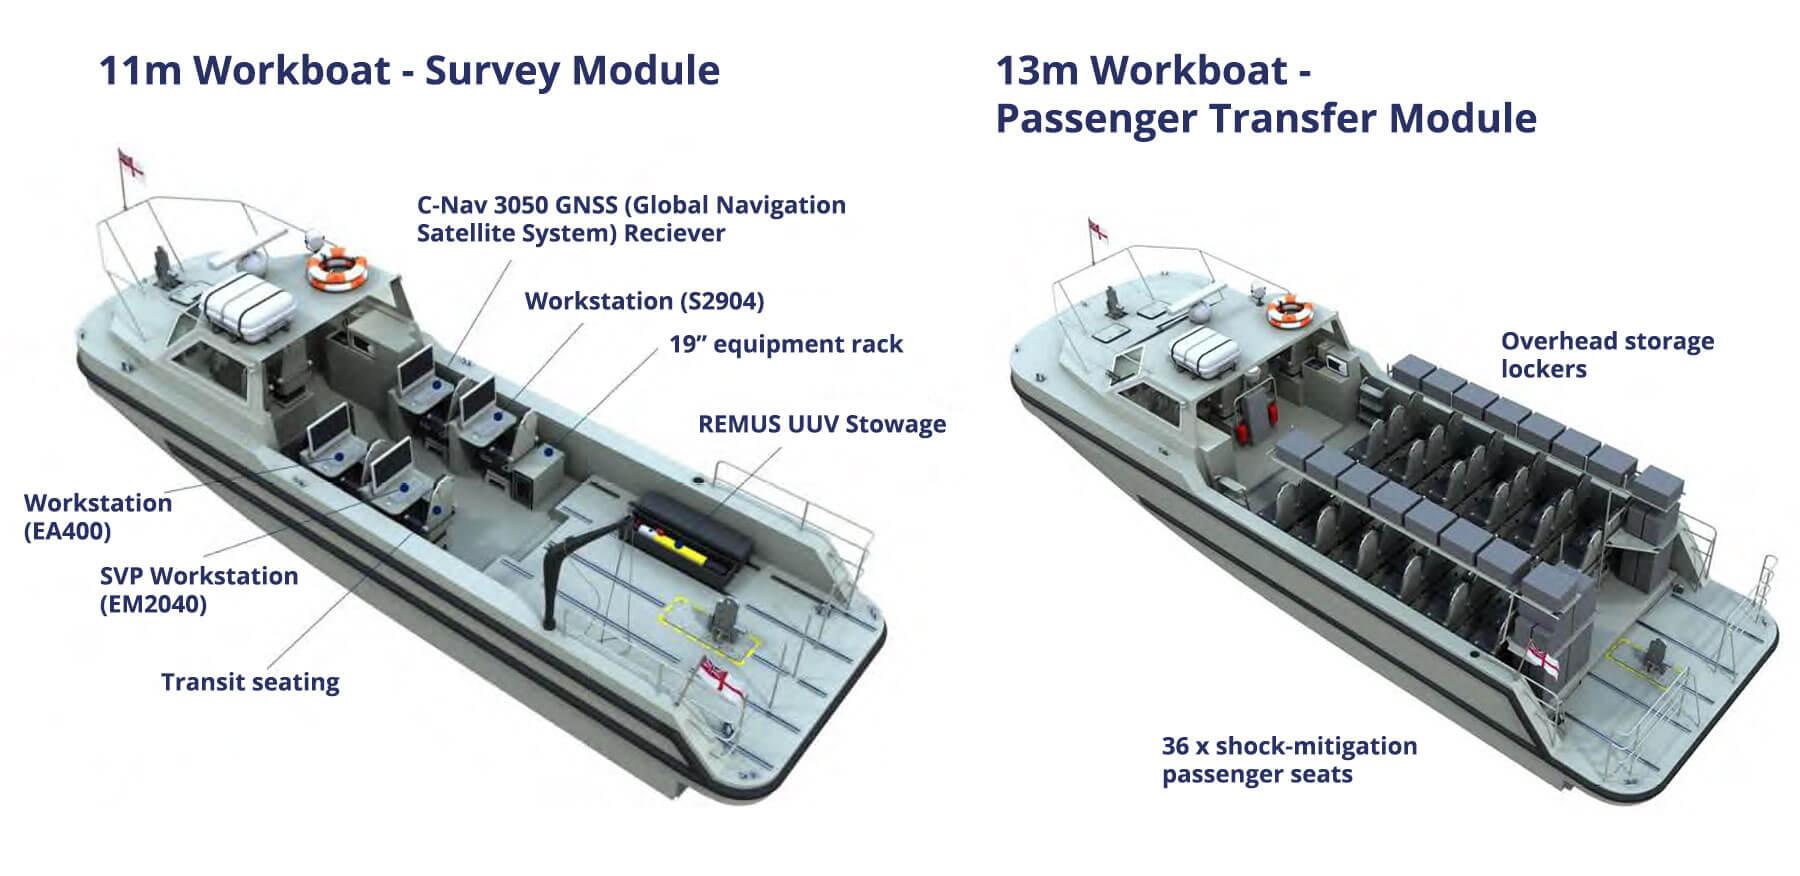 Survey and Passenger Transfer modules